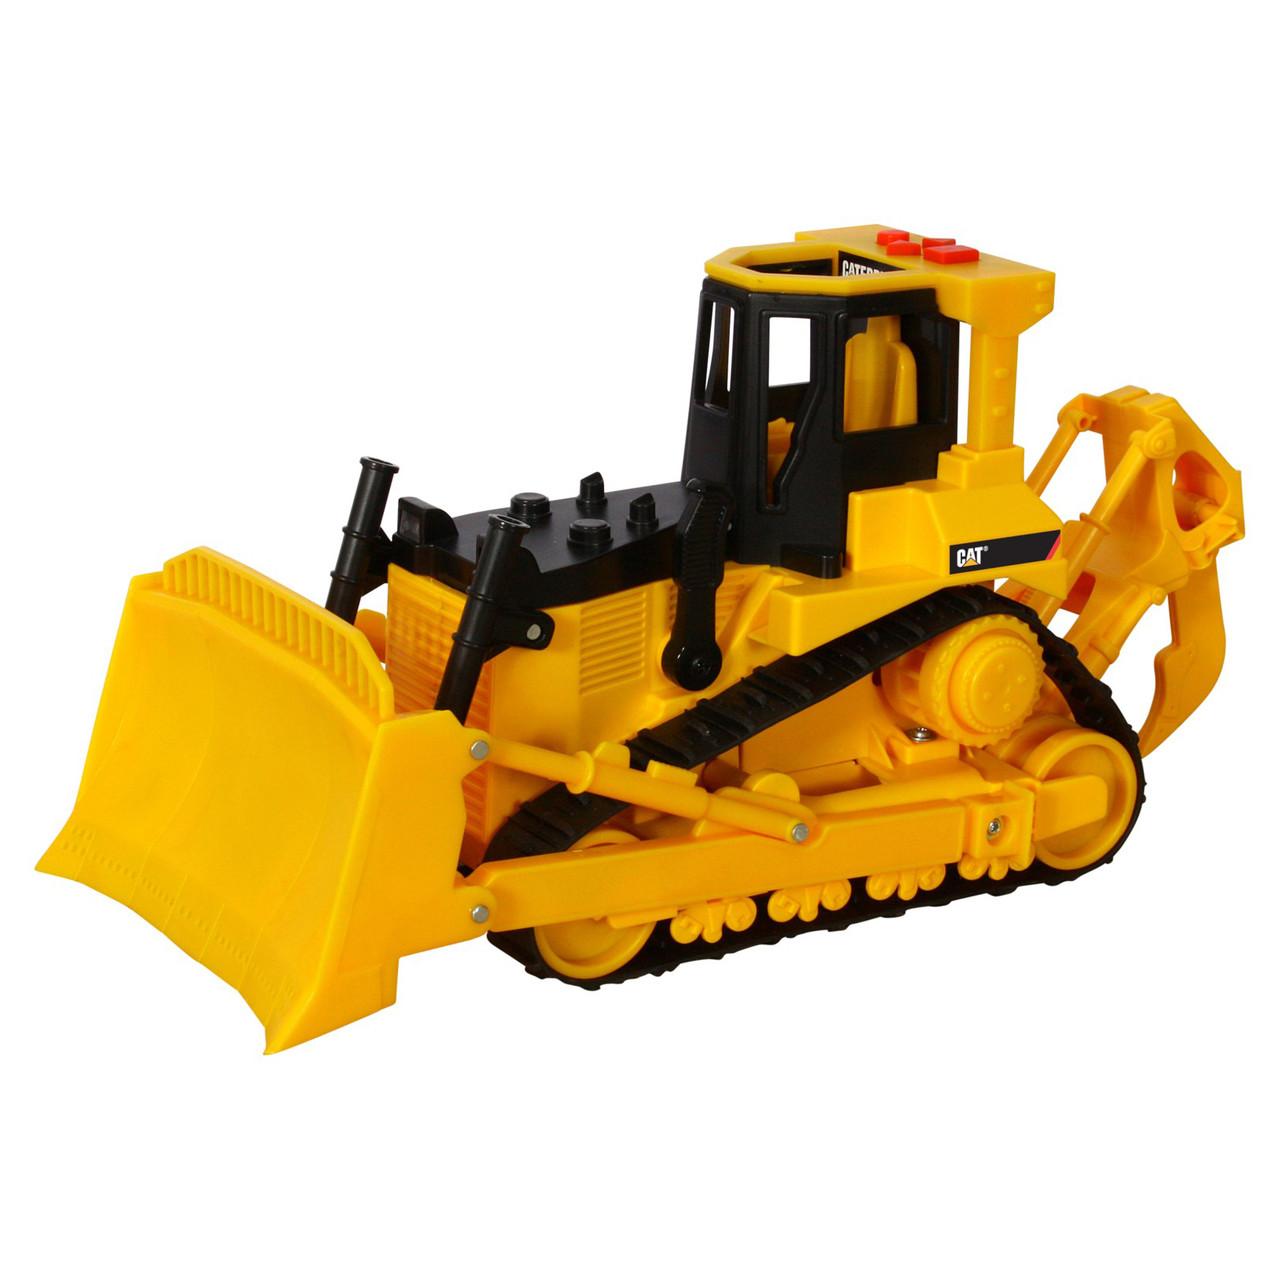 Бульдозер CAT, 33 см «Toy State» (35642)